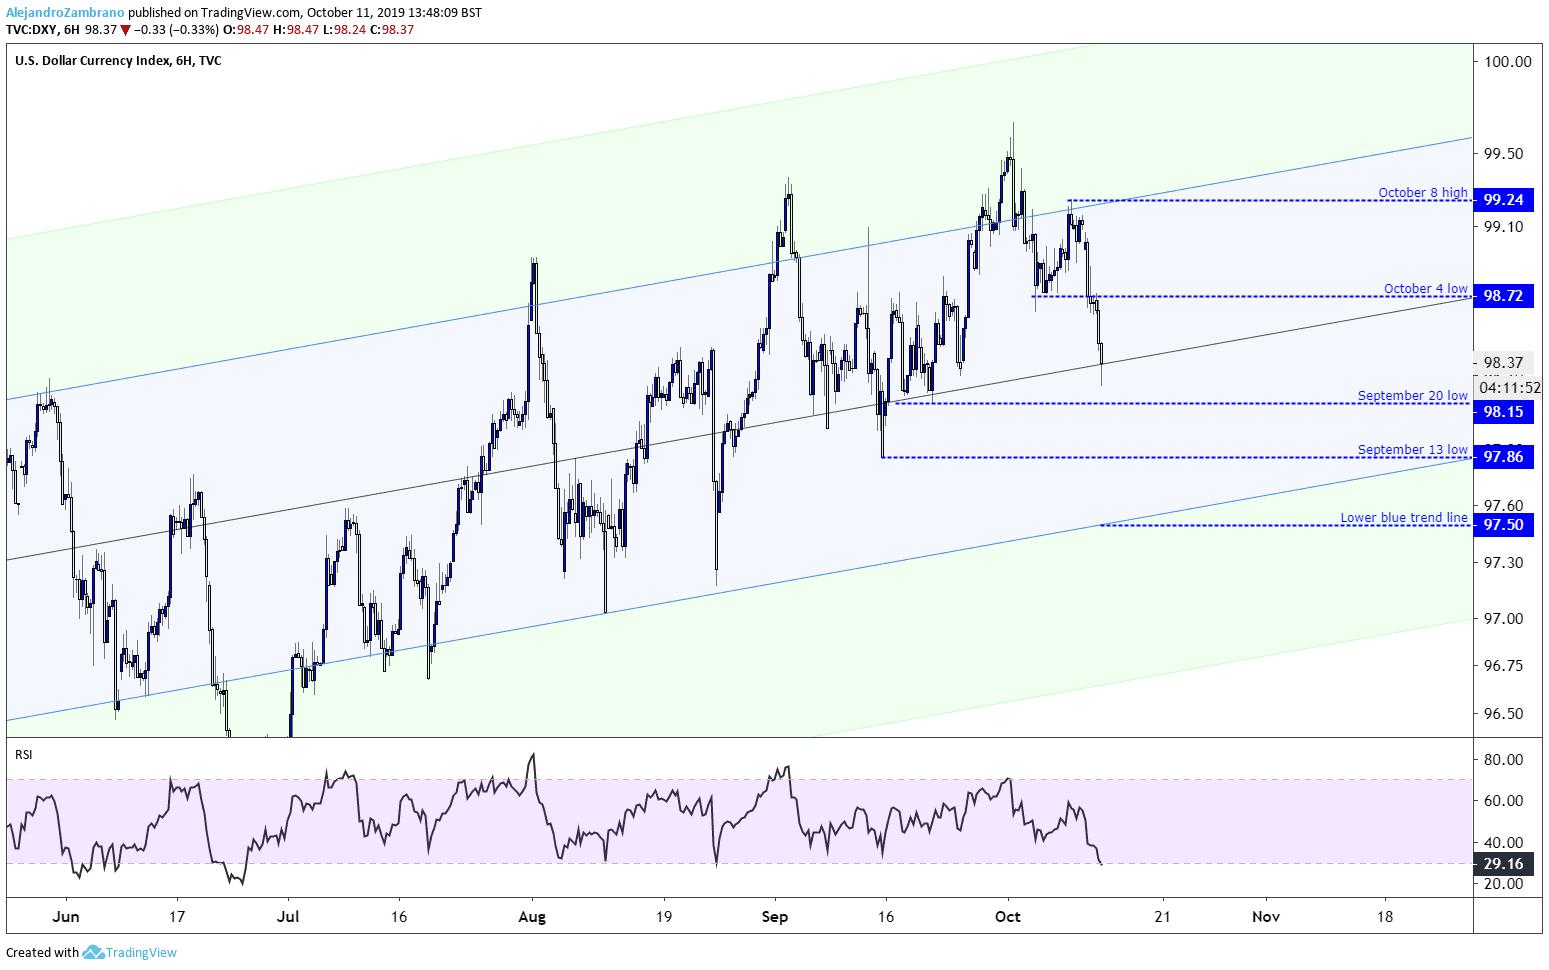 DXY Dollar index chart